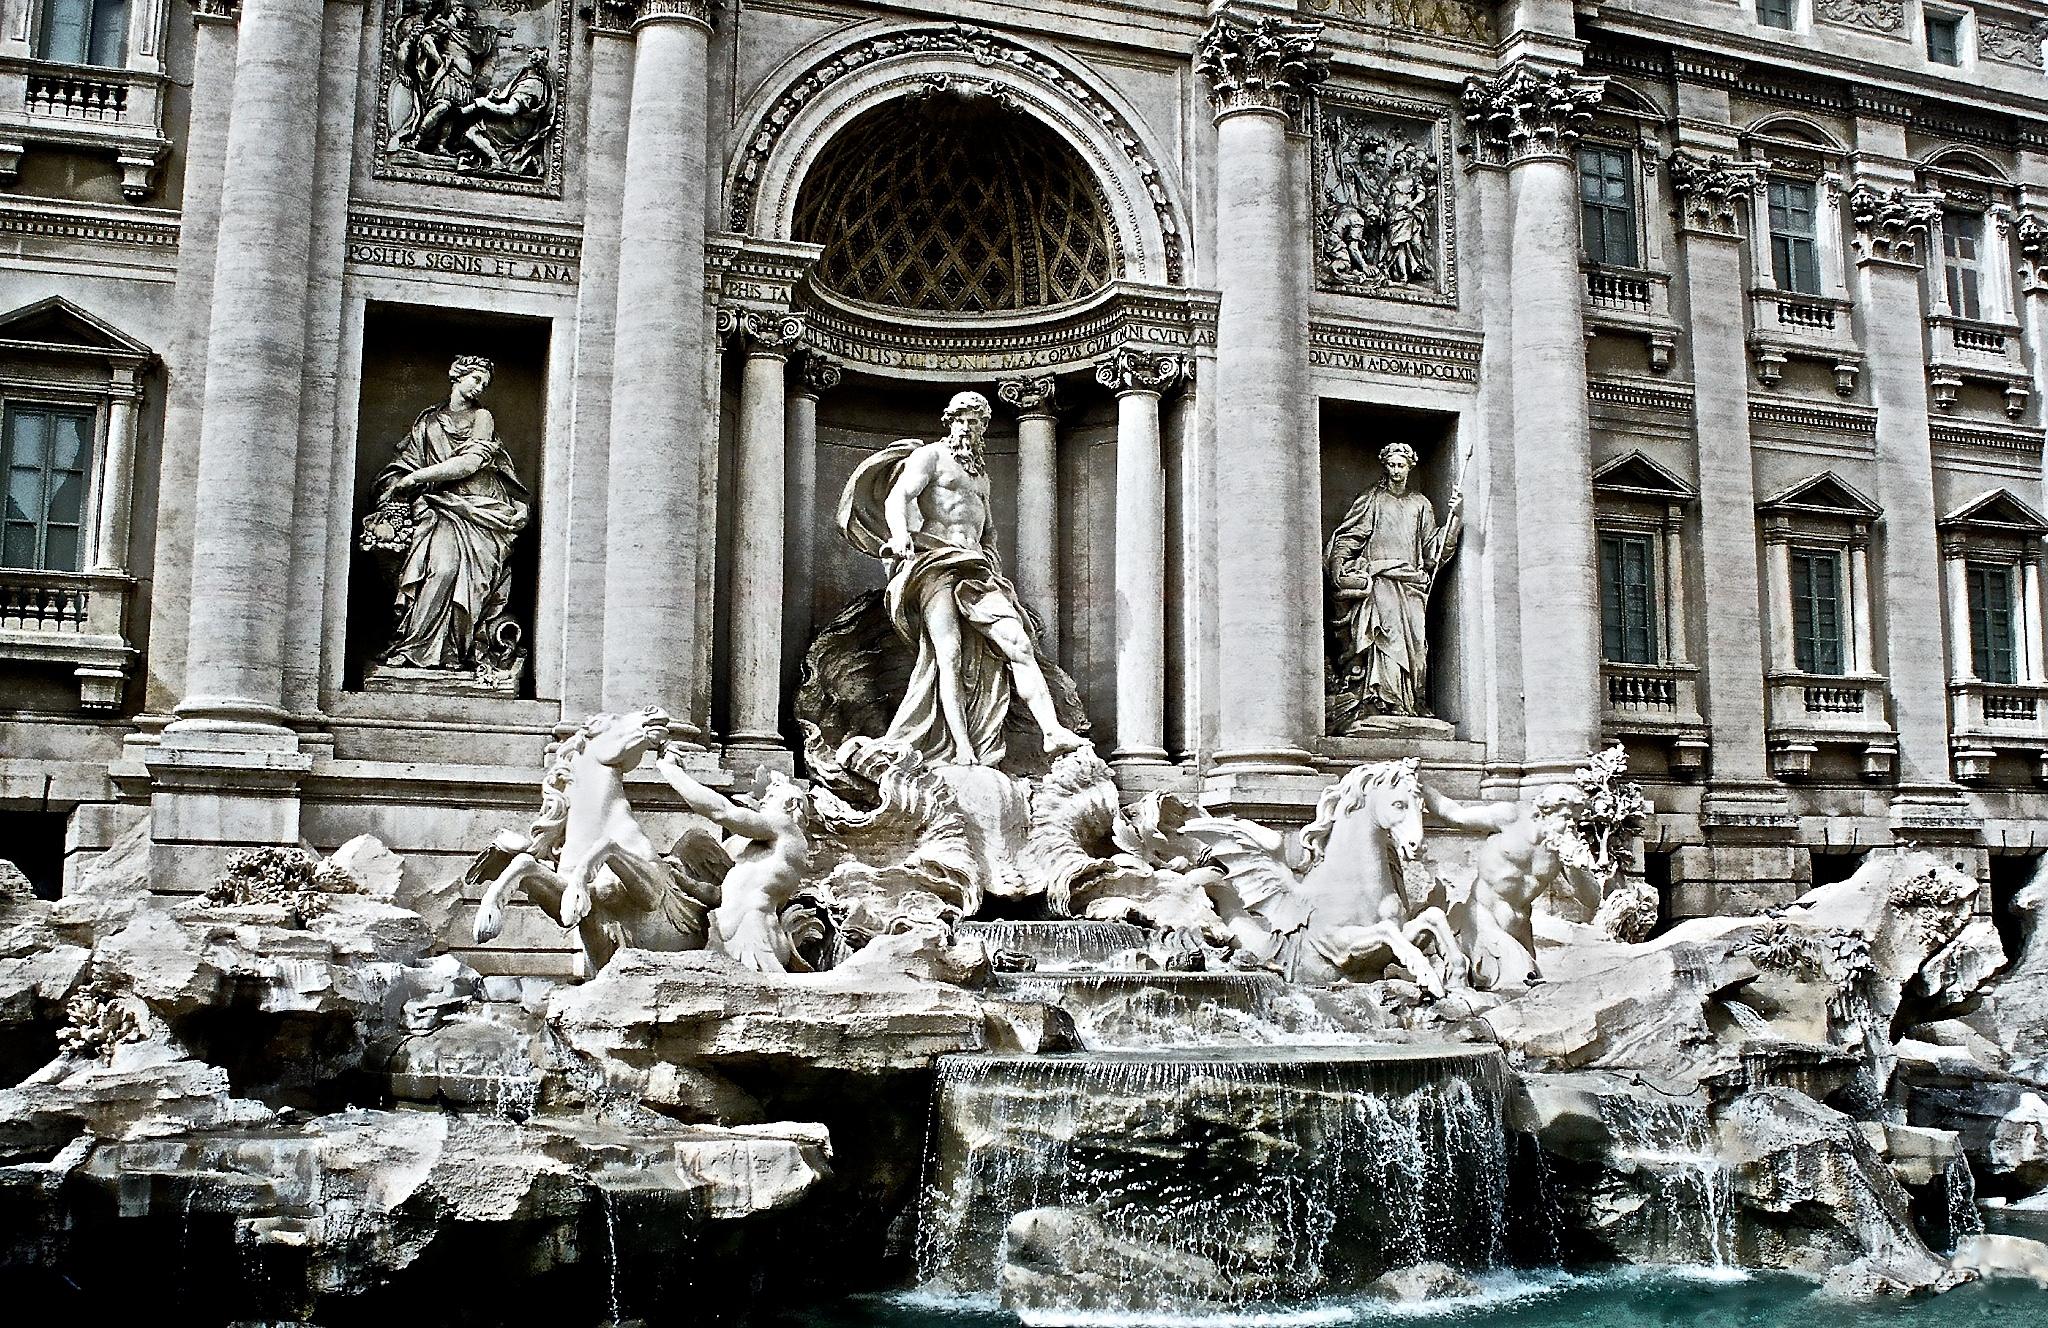 Trevi Fountain, Rome  |  Europe Gallery